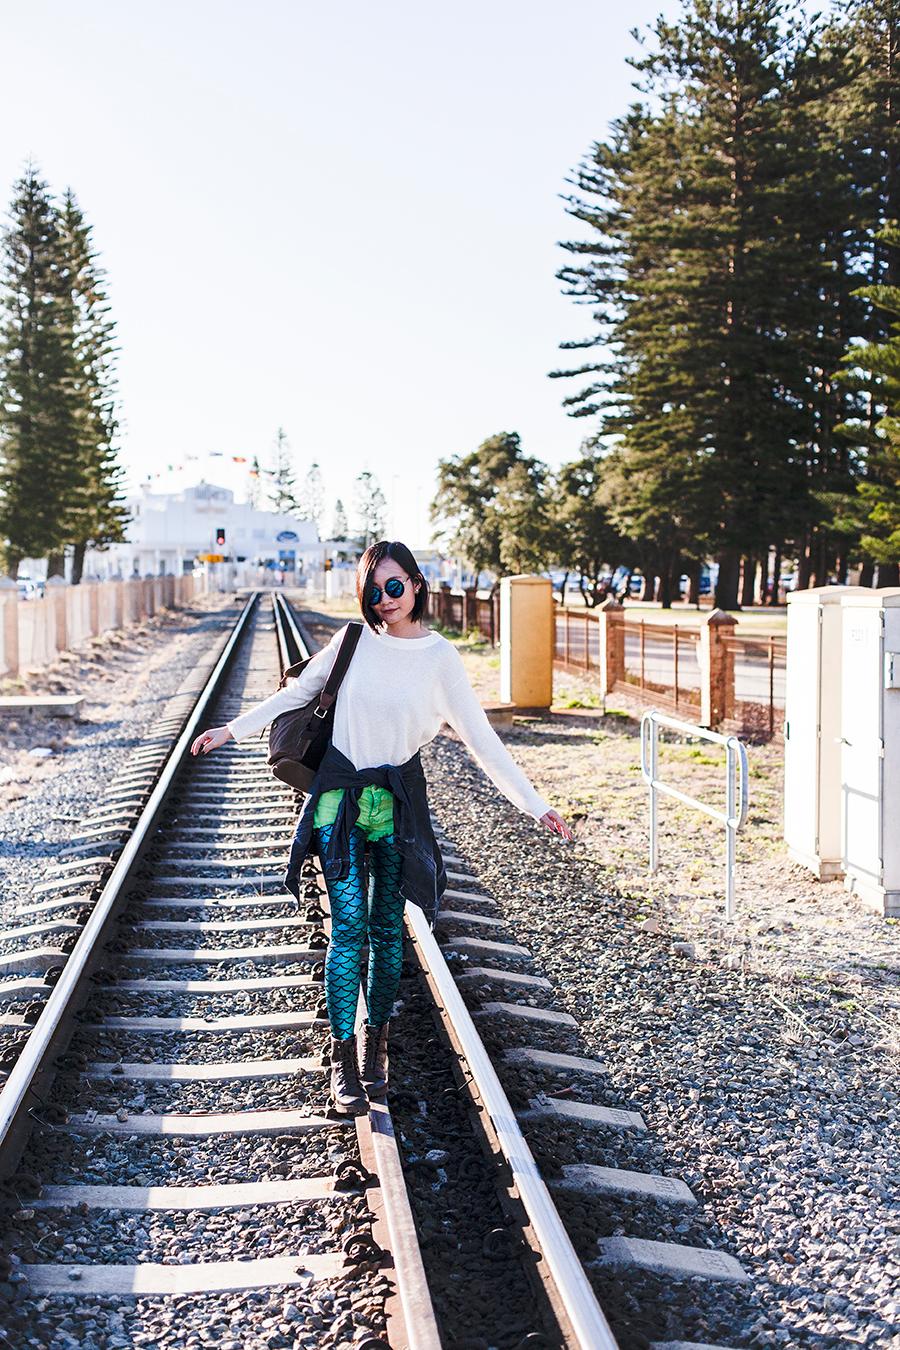 Railroad outfit: GU white knit sweater, Forever 21 green crop denim shorts, mermaid shimmer leggings, Blend denim jacket, Fossil backpack, Steve Madden boots.